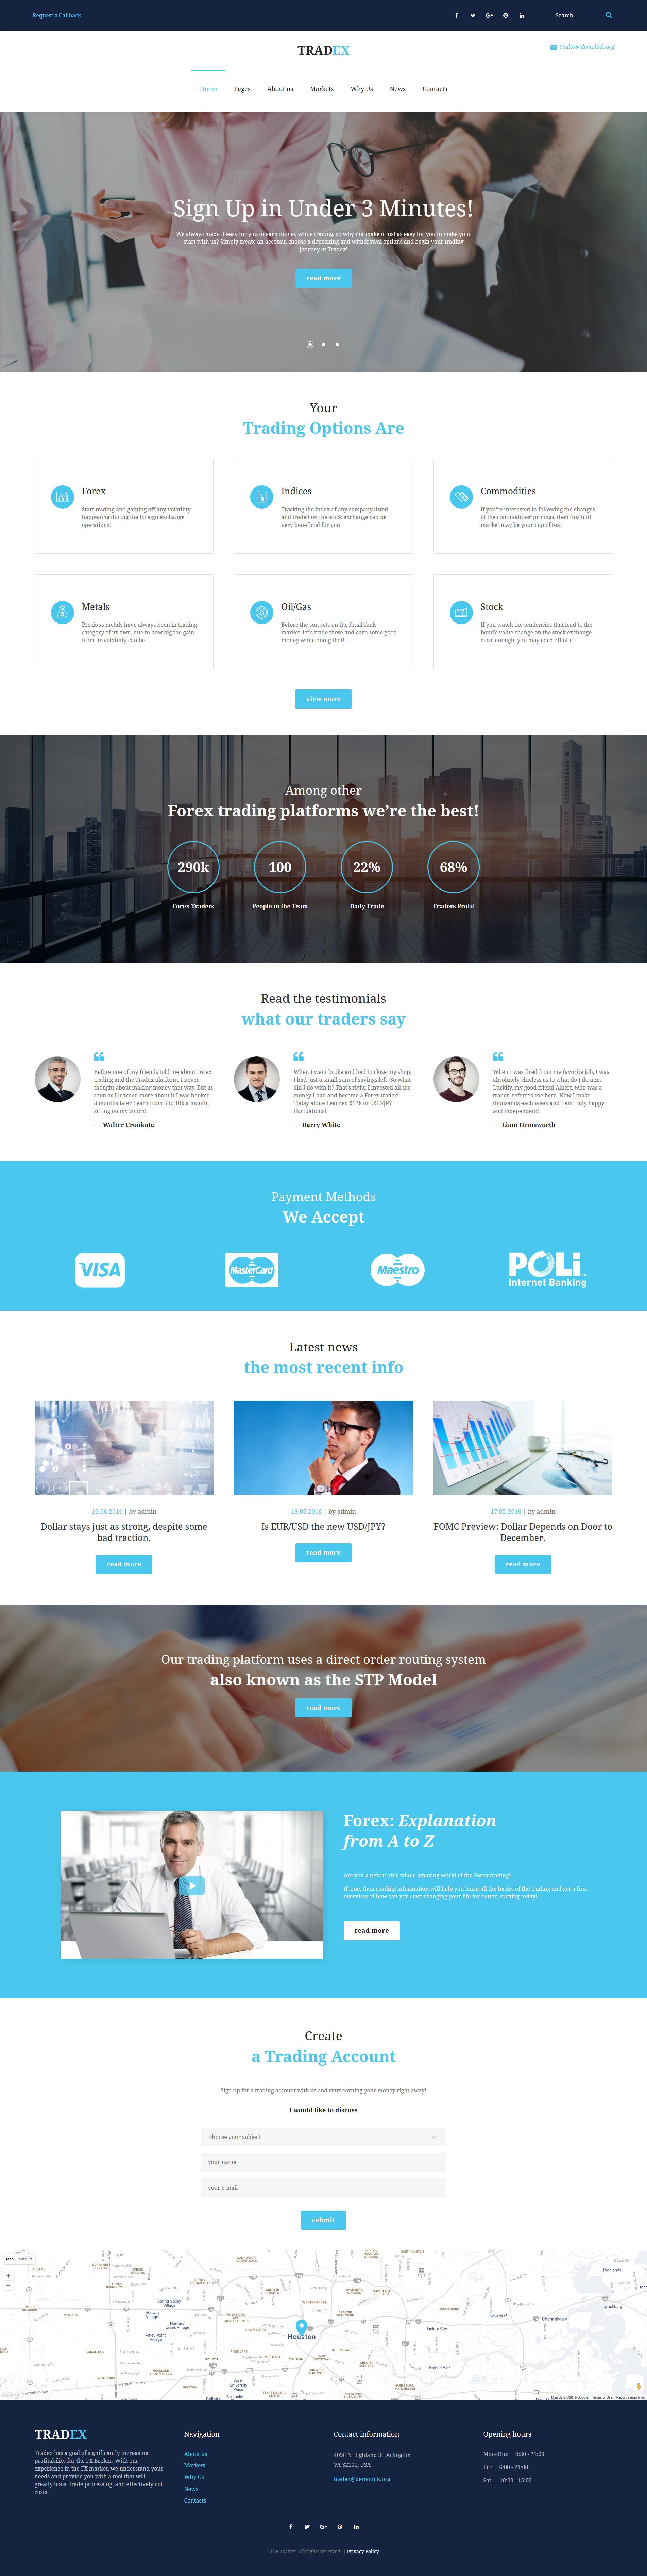 Design web forex